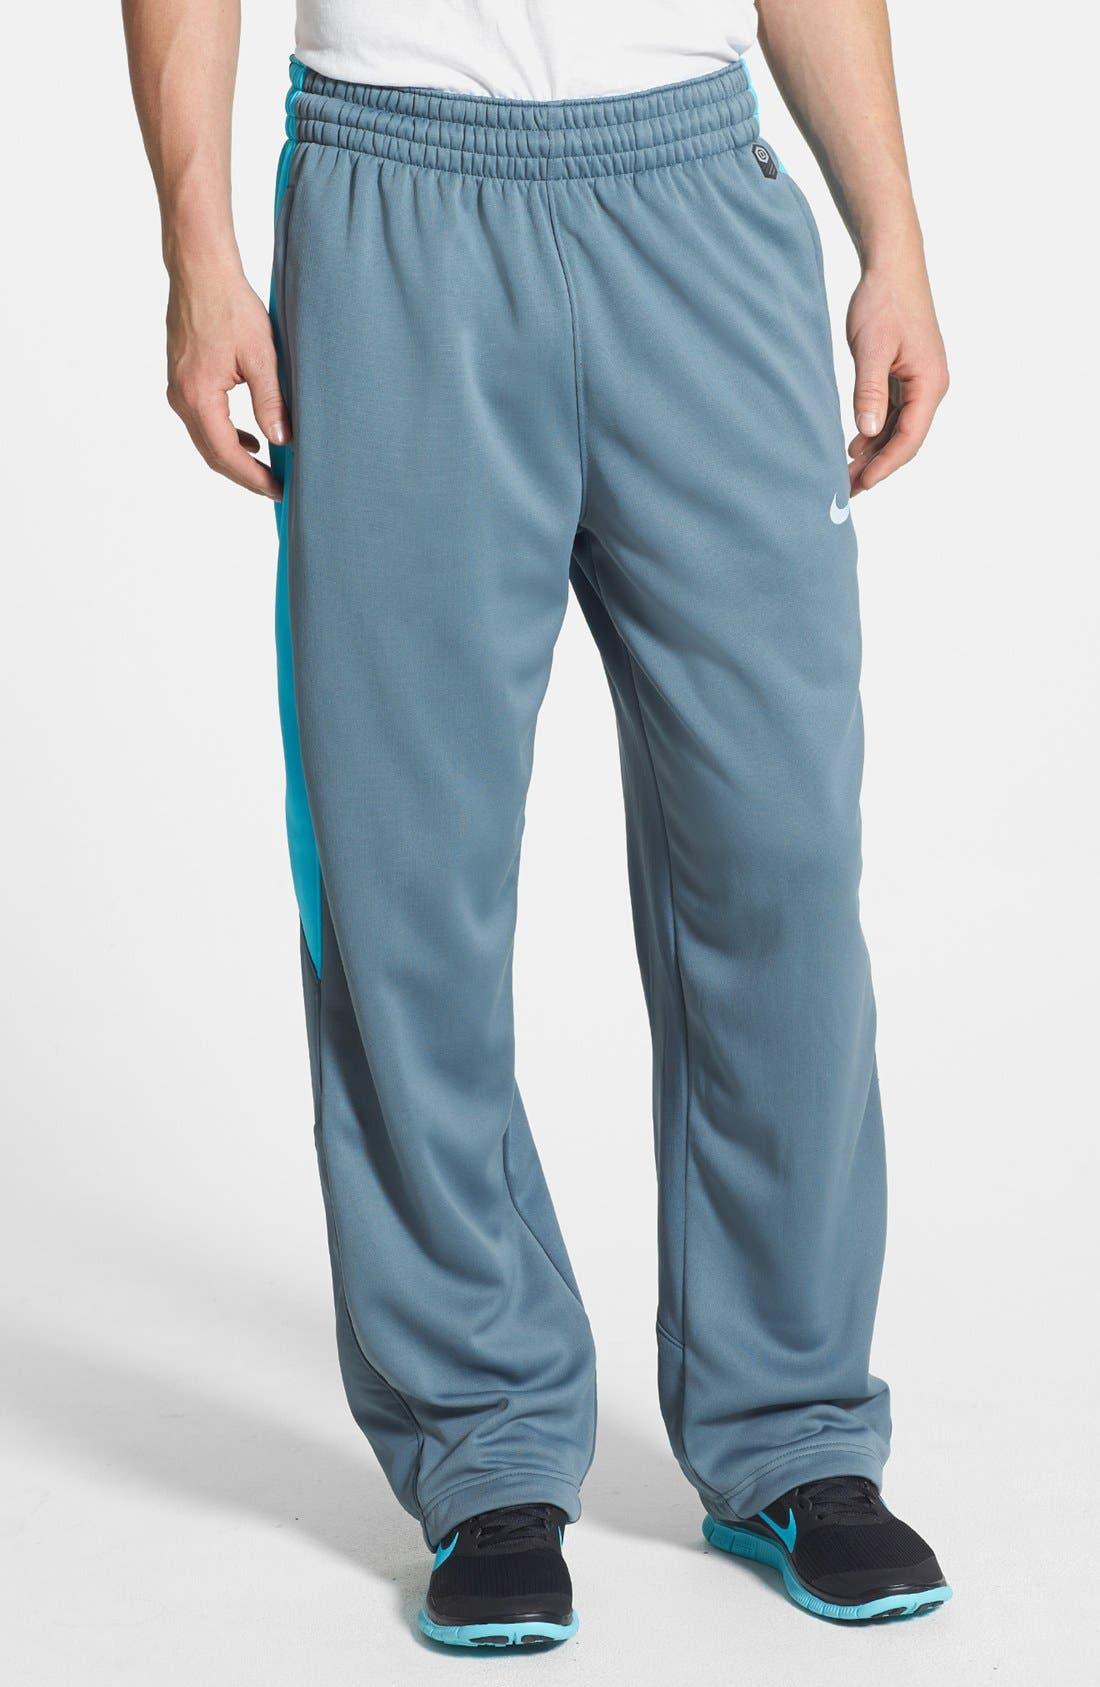 Alternate Image 1 Selected - Nike 'Hero' Fleece Pants